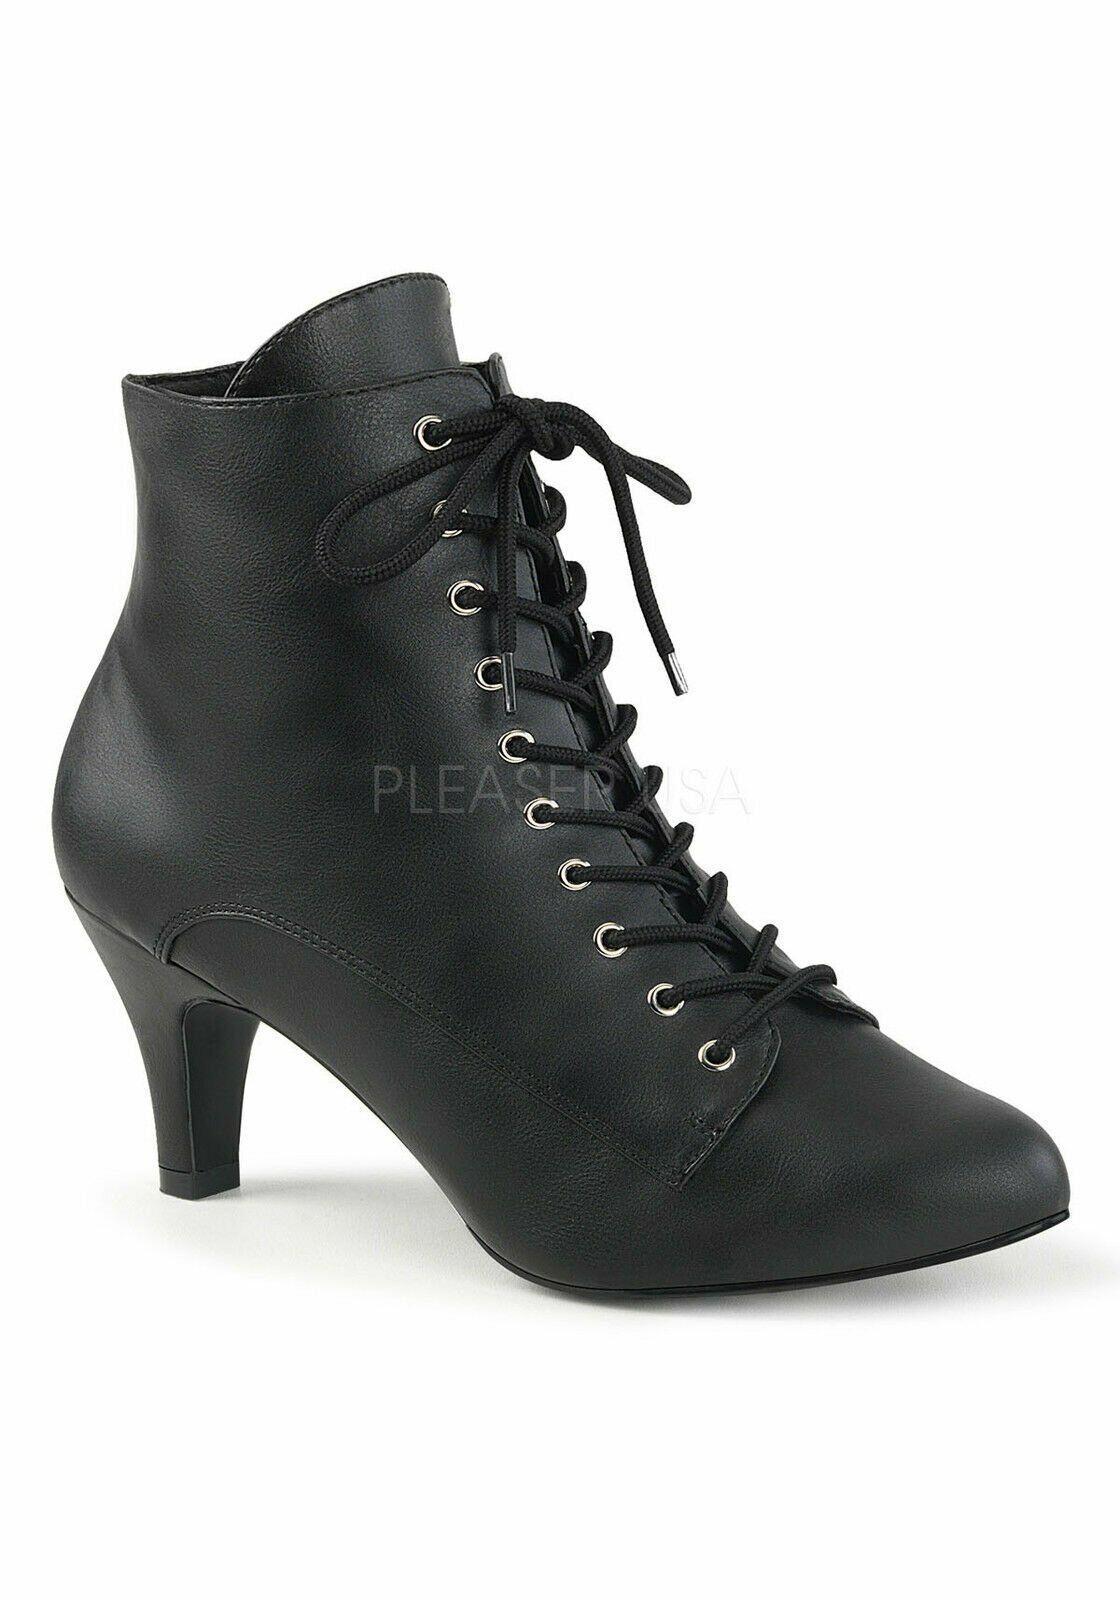 Pleaser DIVINE-1020 3 Inch Inch Inch Heel Ankle avvio 114aa9